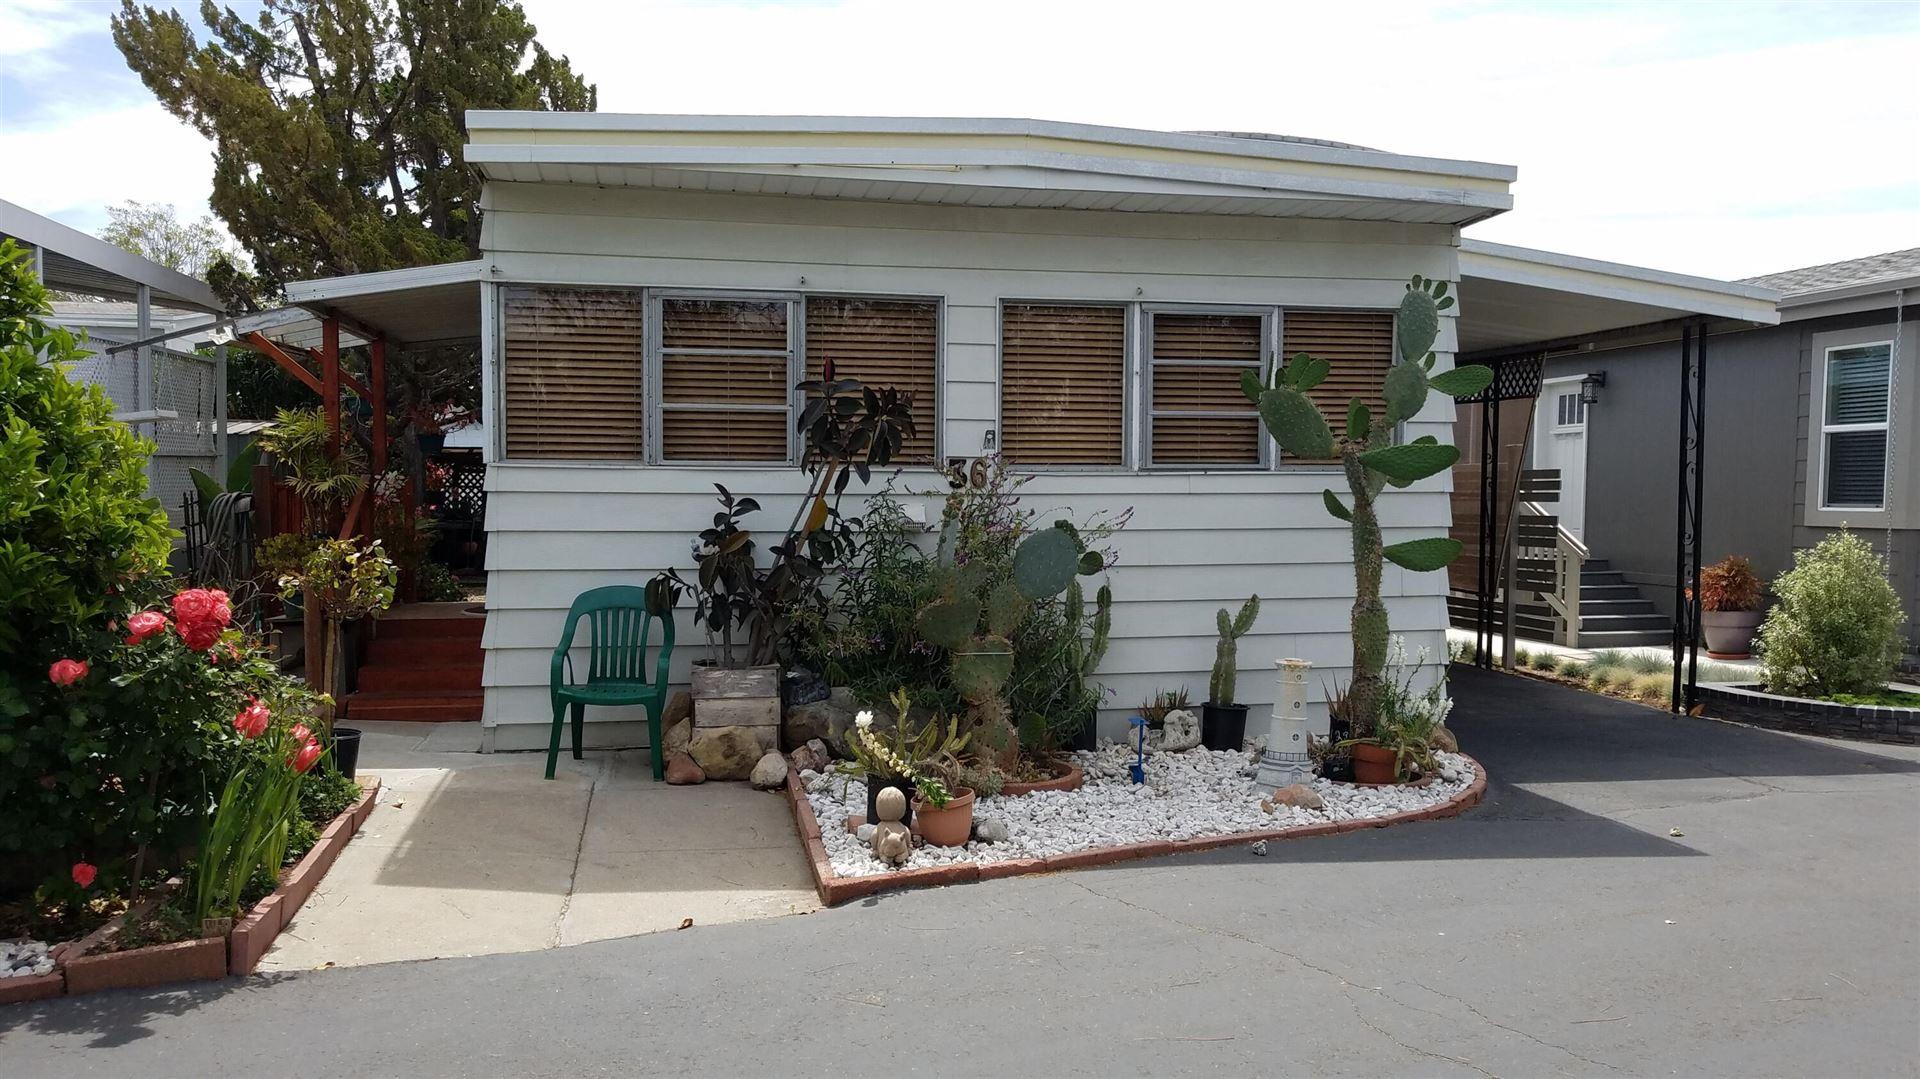 333 Old Mill Rd #Spc 36, Santa Barbara, CA 93110 - MLS#: 21-2040